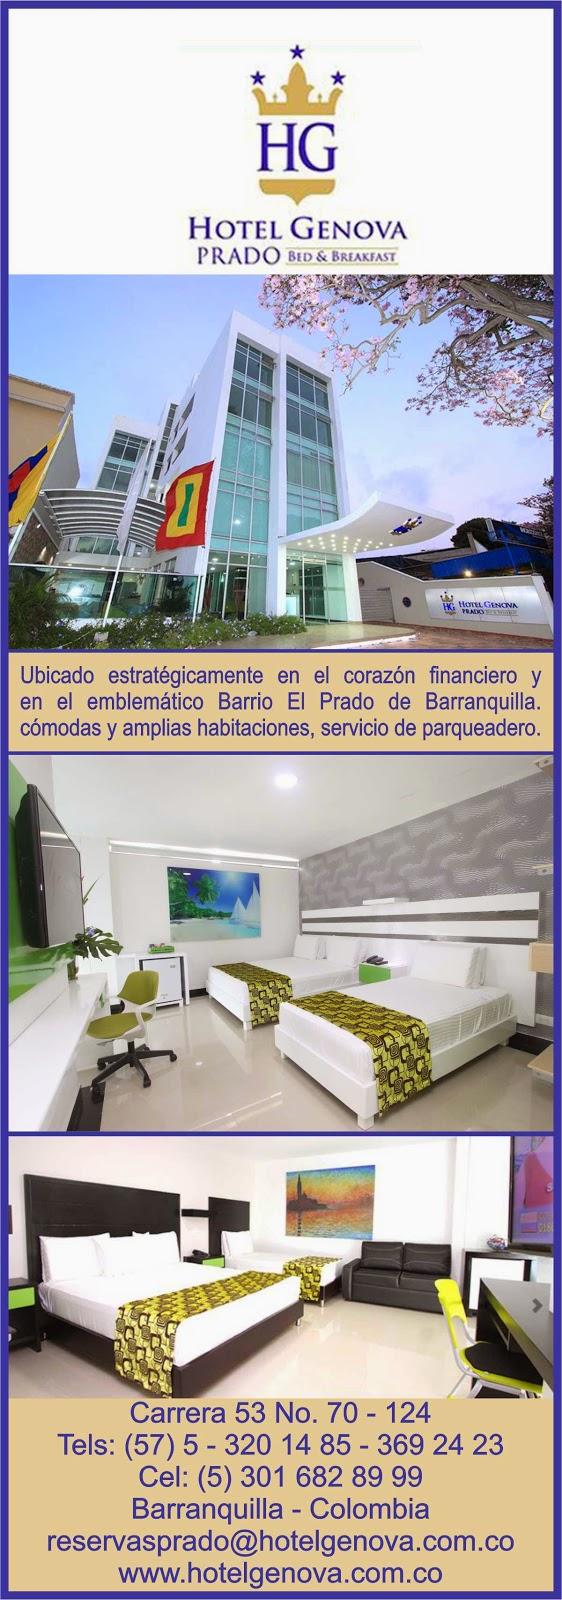 hotel_genova_prado_vamosenmovimiento.blogspot.com_hotelgenova.com.co